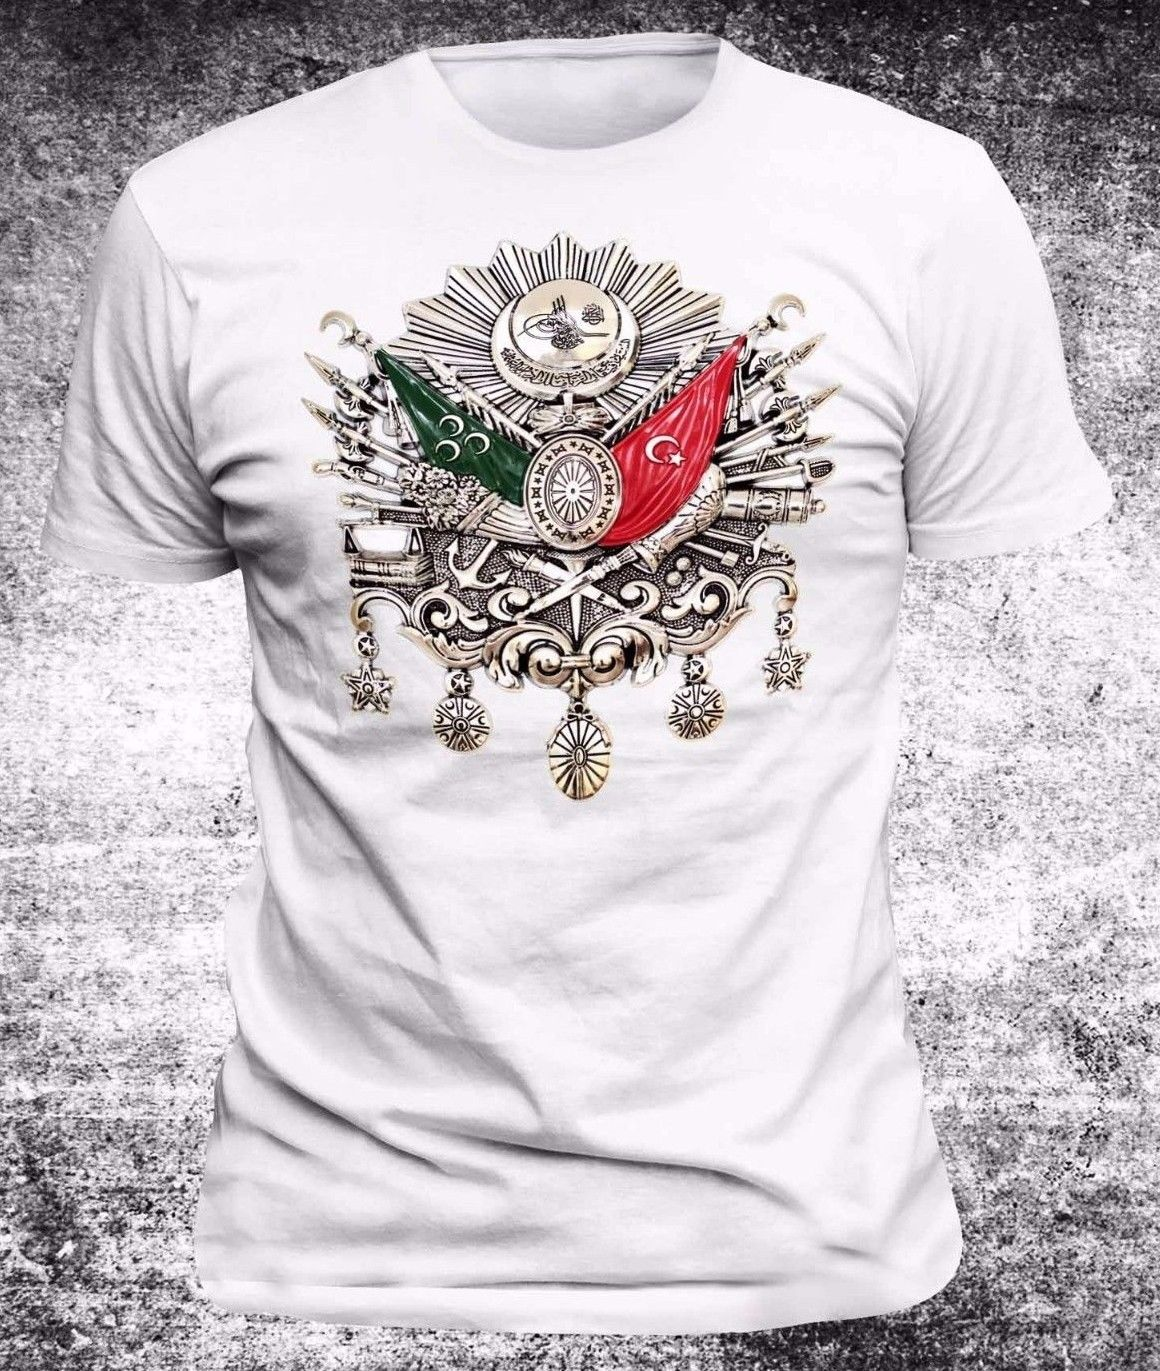 Camiseta de gran oferta 2018 Turkiye, The Ottoman litenant, Estambul, Turkei, camiseta de estilo veraniego, camiseta Harajuku Streetwear